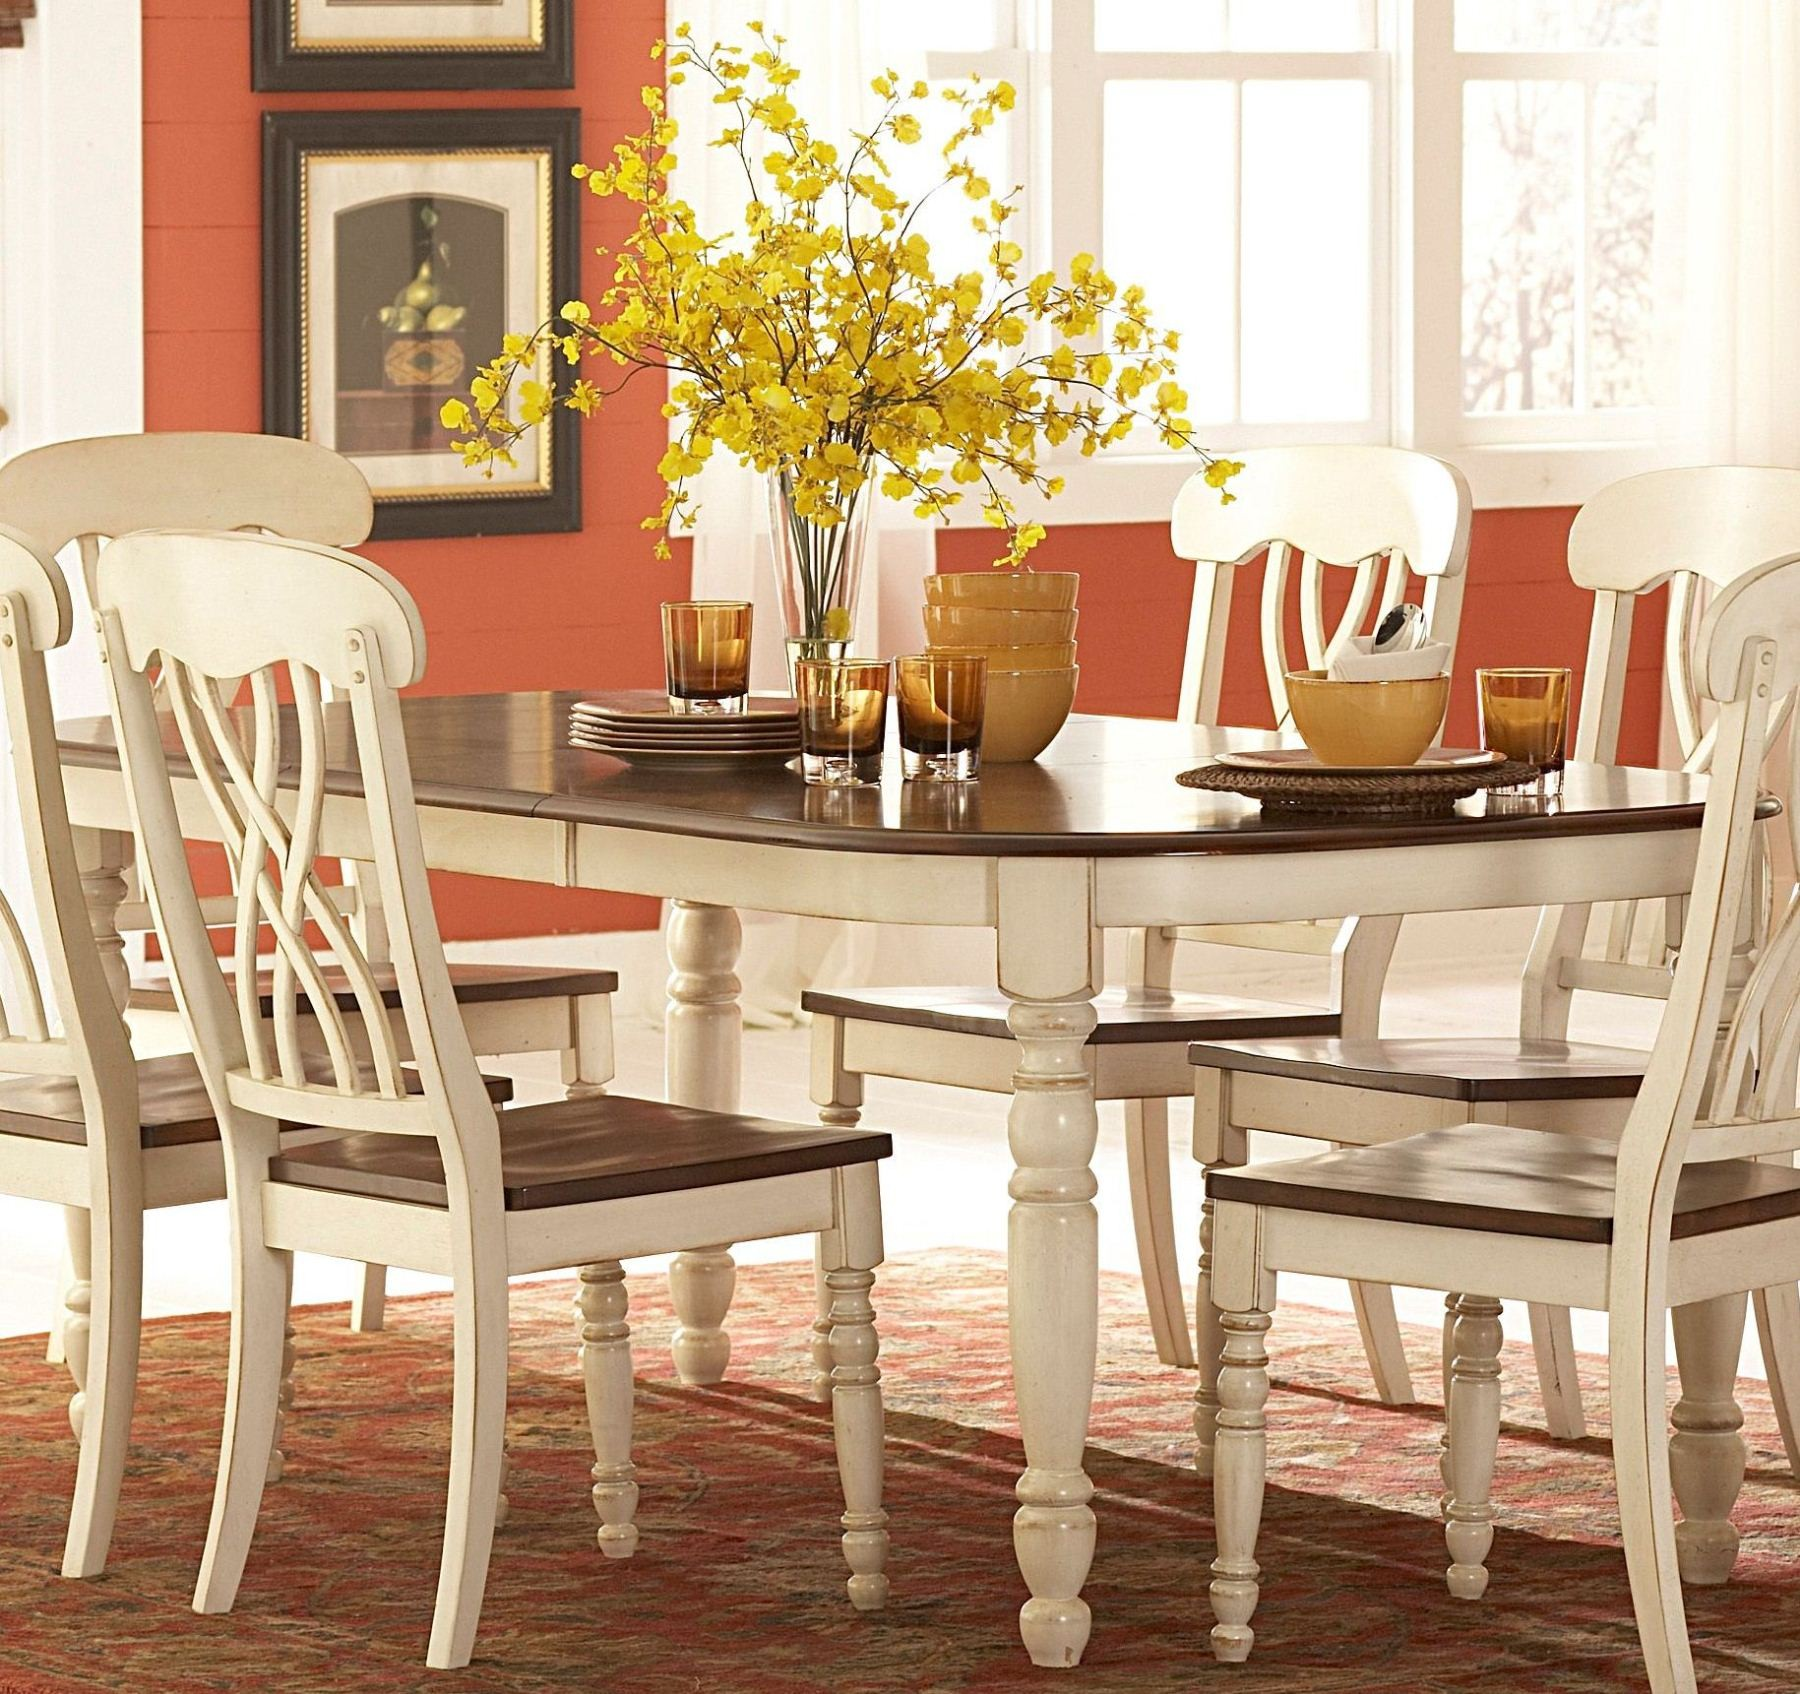 Rectangular Extendable Dining Table: Ohana White Rectangular Extendable Dining Table From